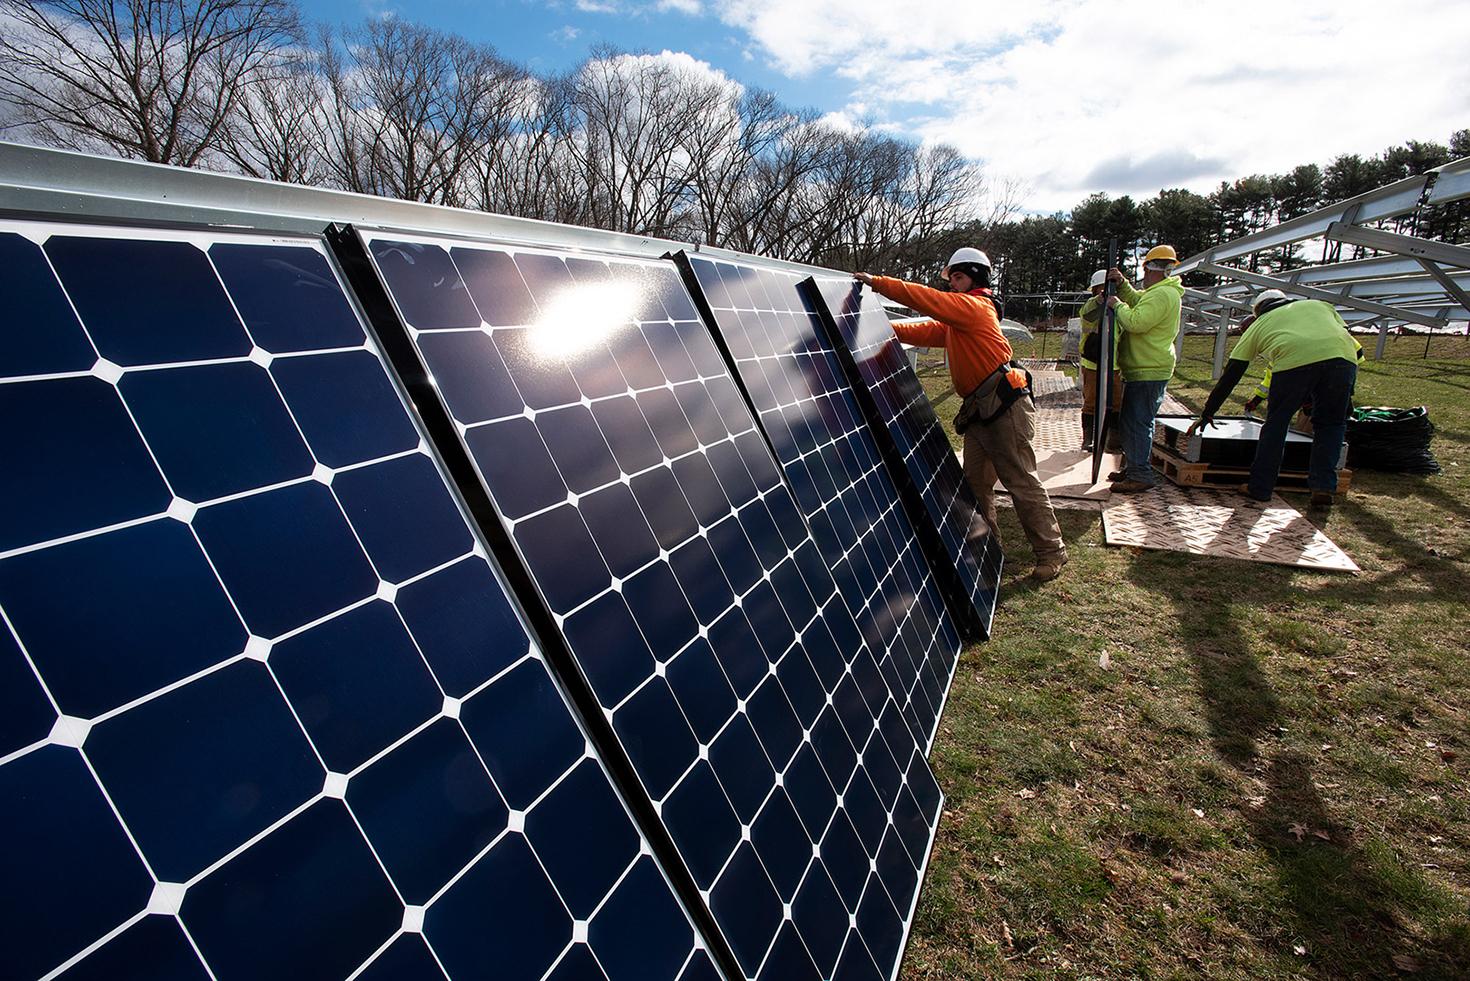 Arboretum Gets a Solar Boost